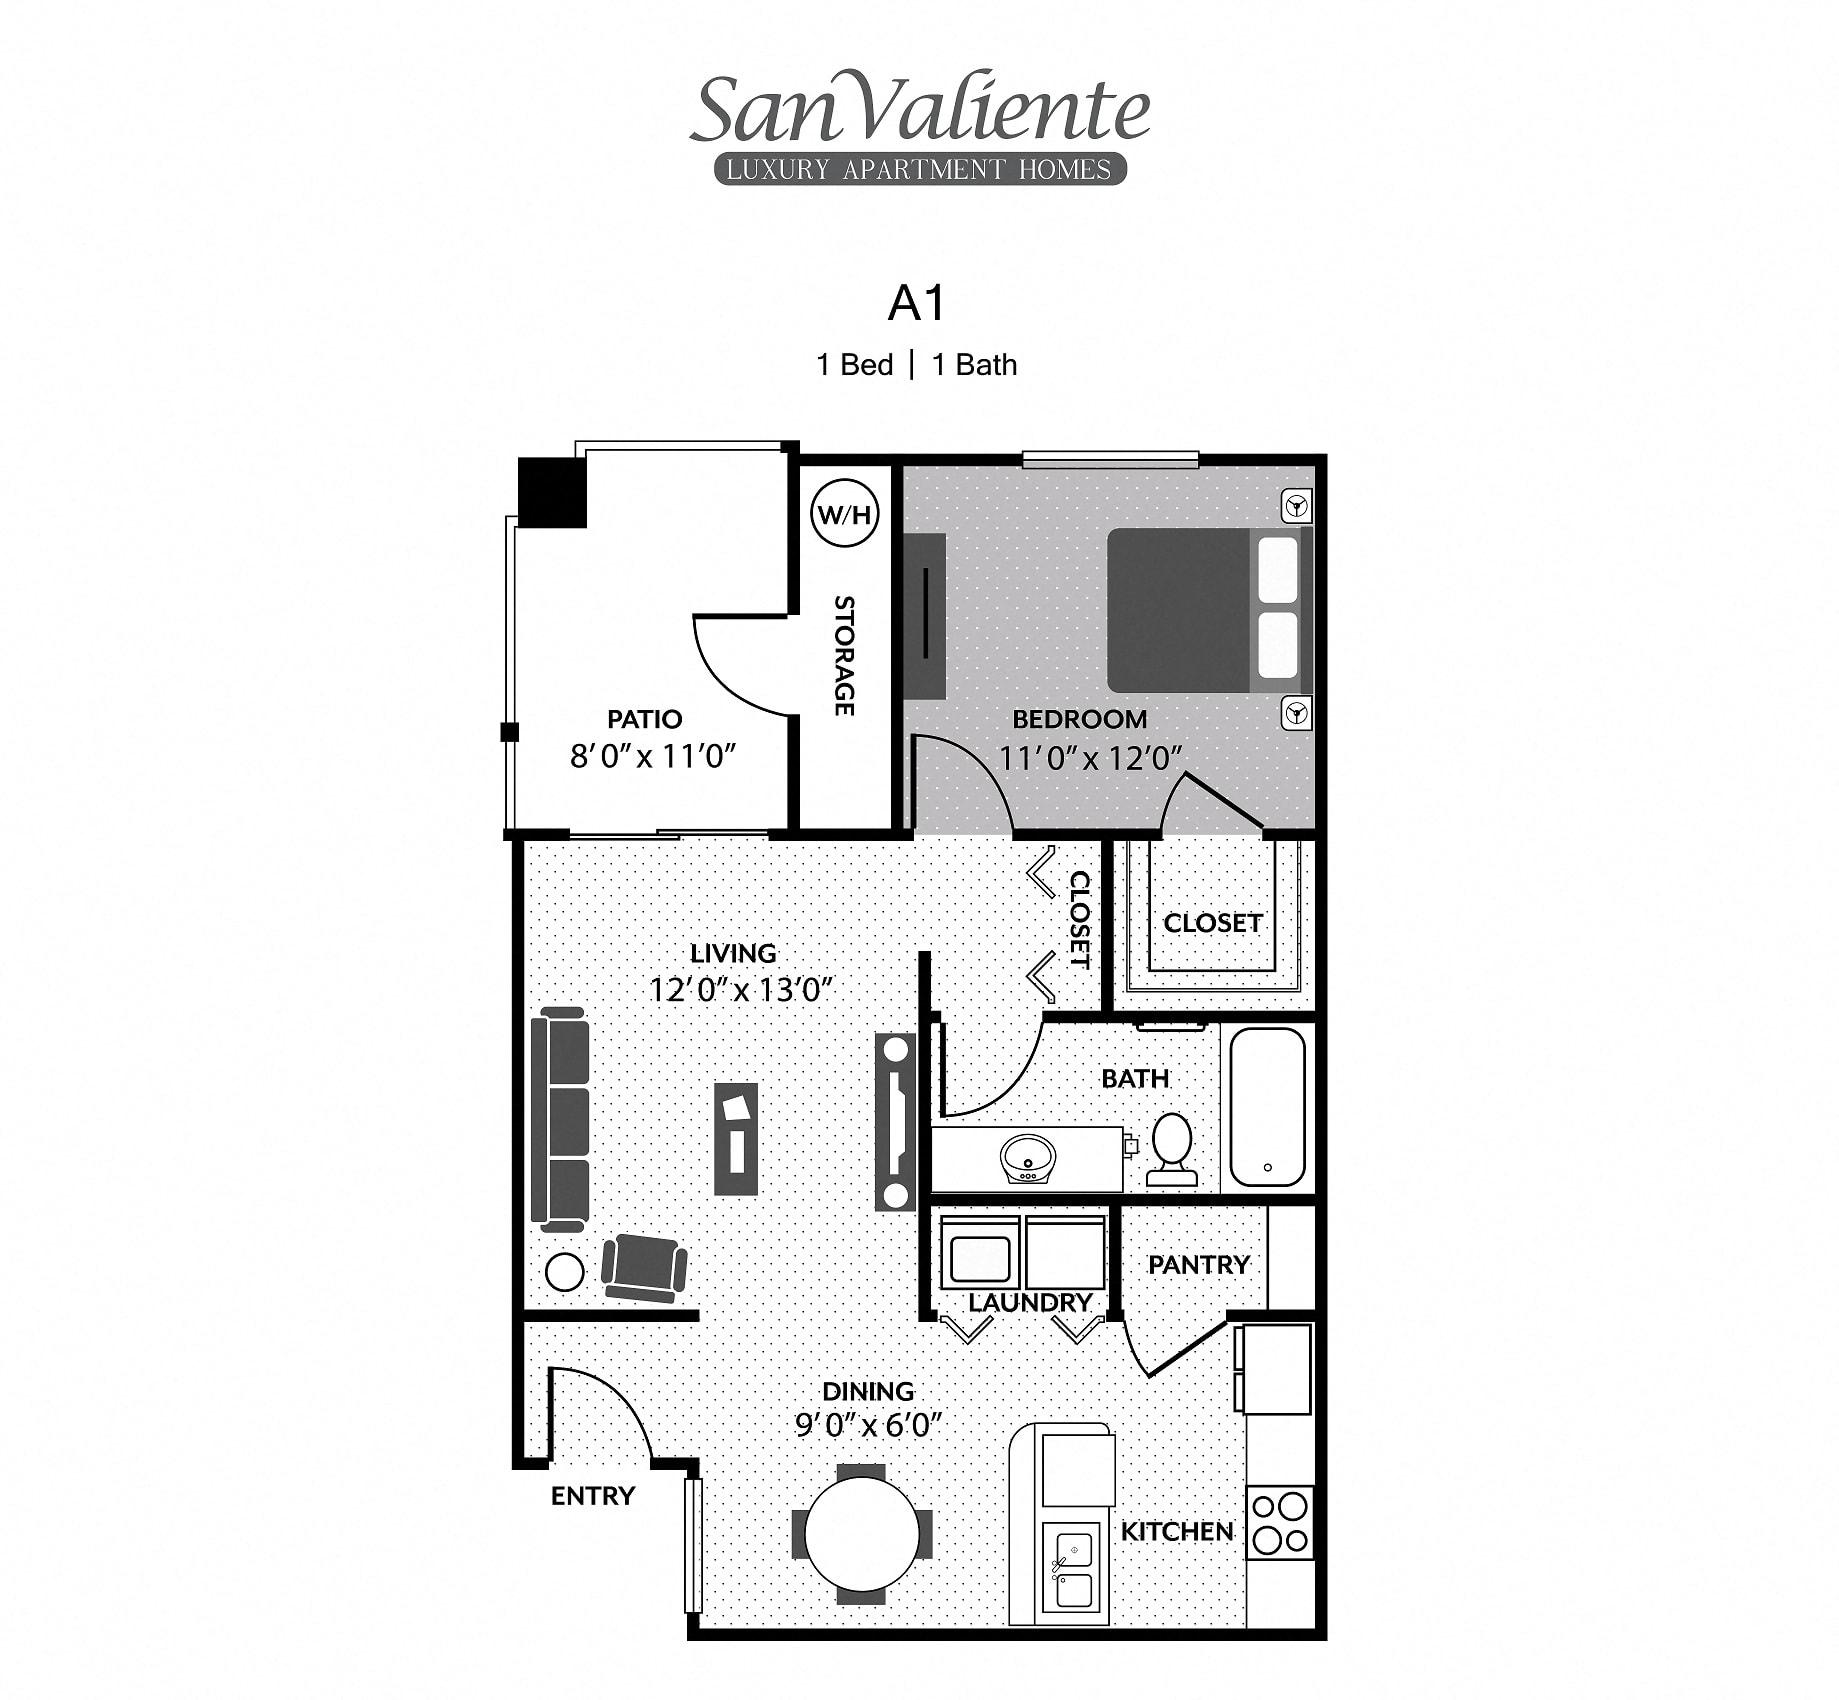 San Valiente : A1 Floorplan : 1B/1B